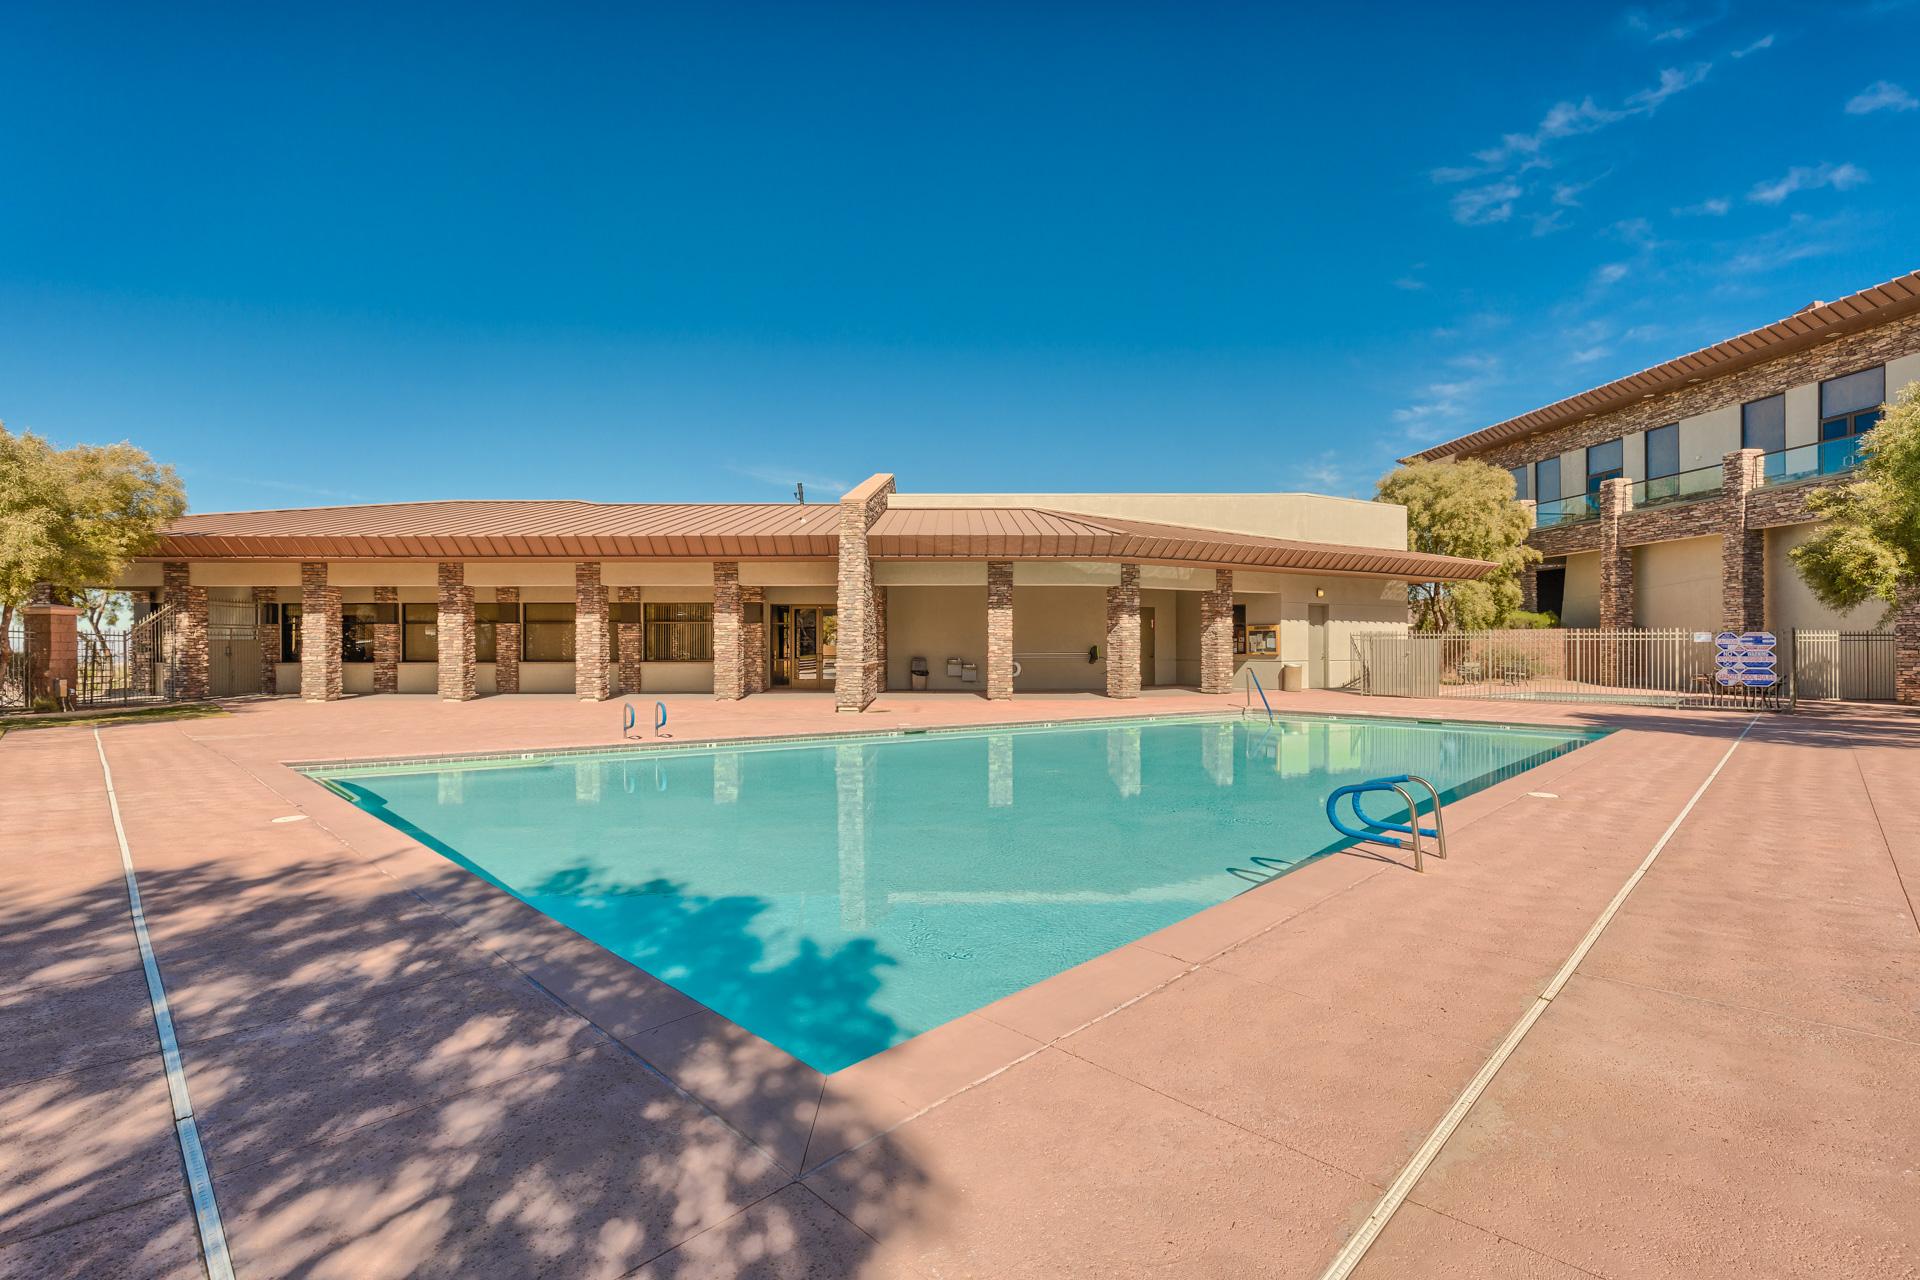 MacDonald Highlands Pool